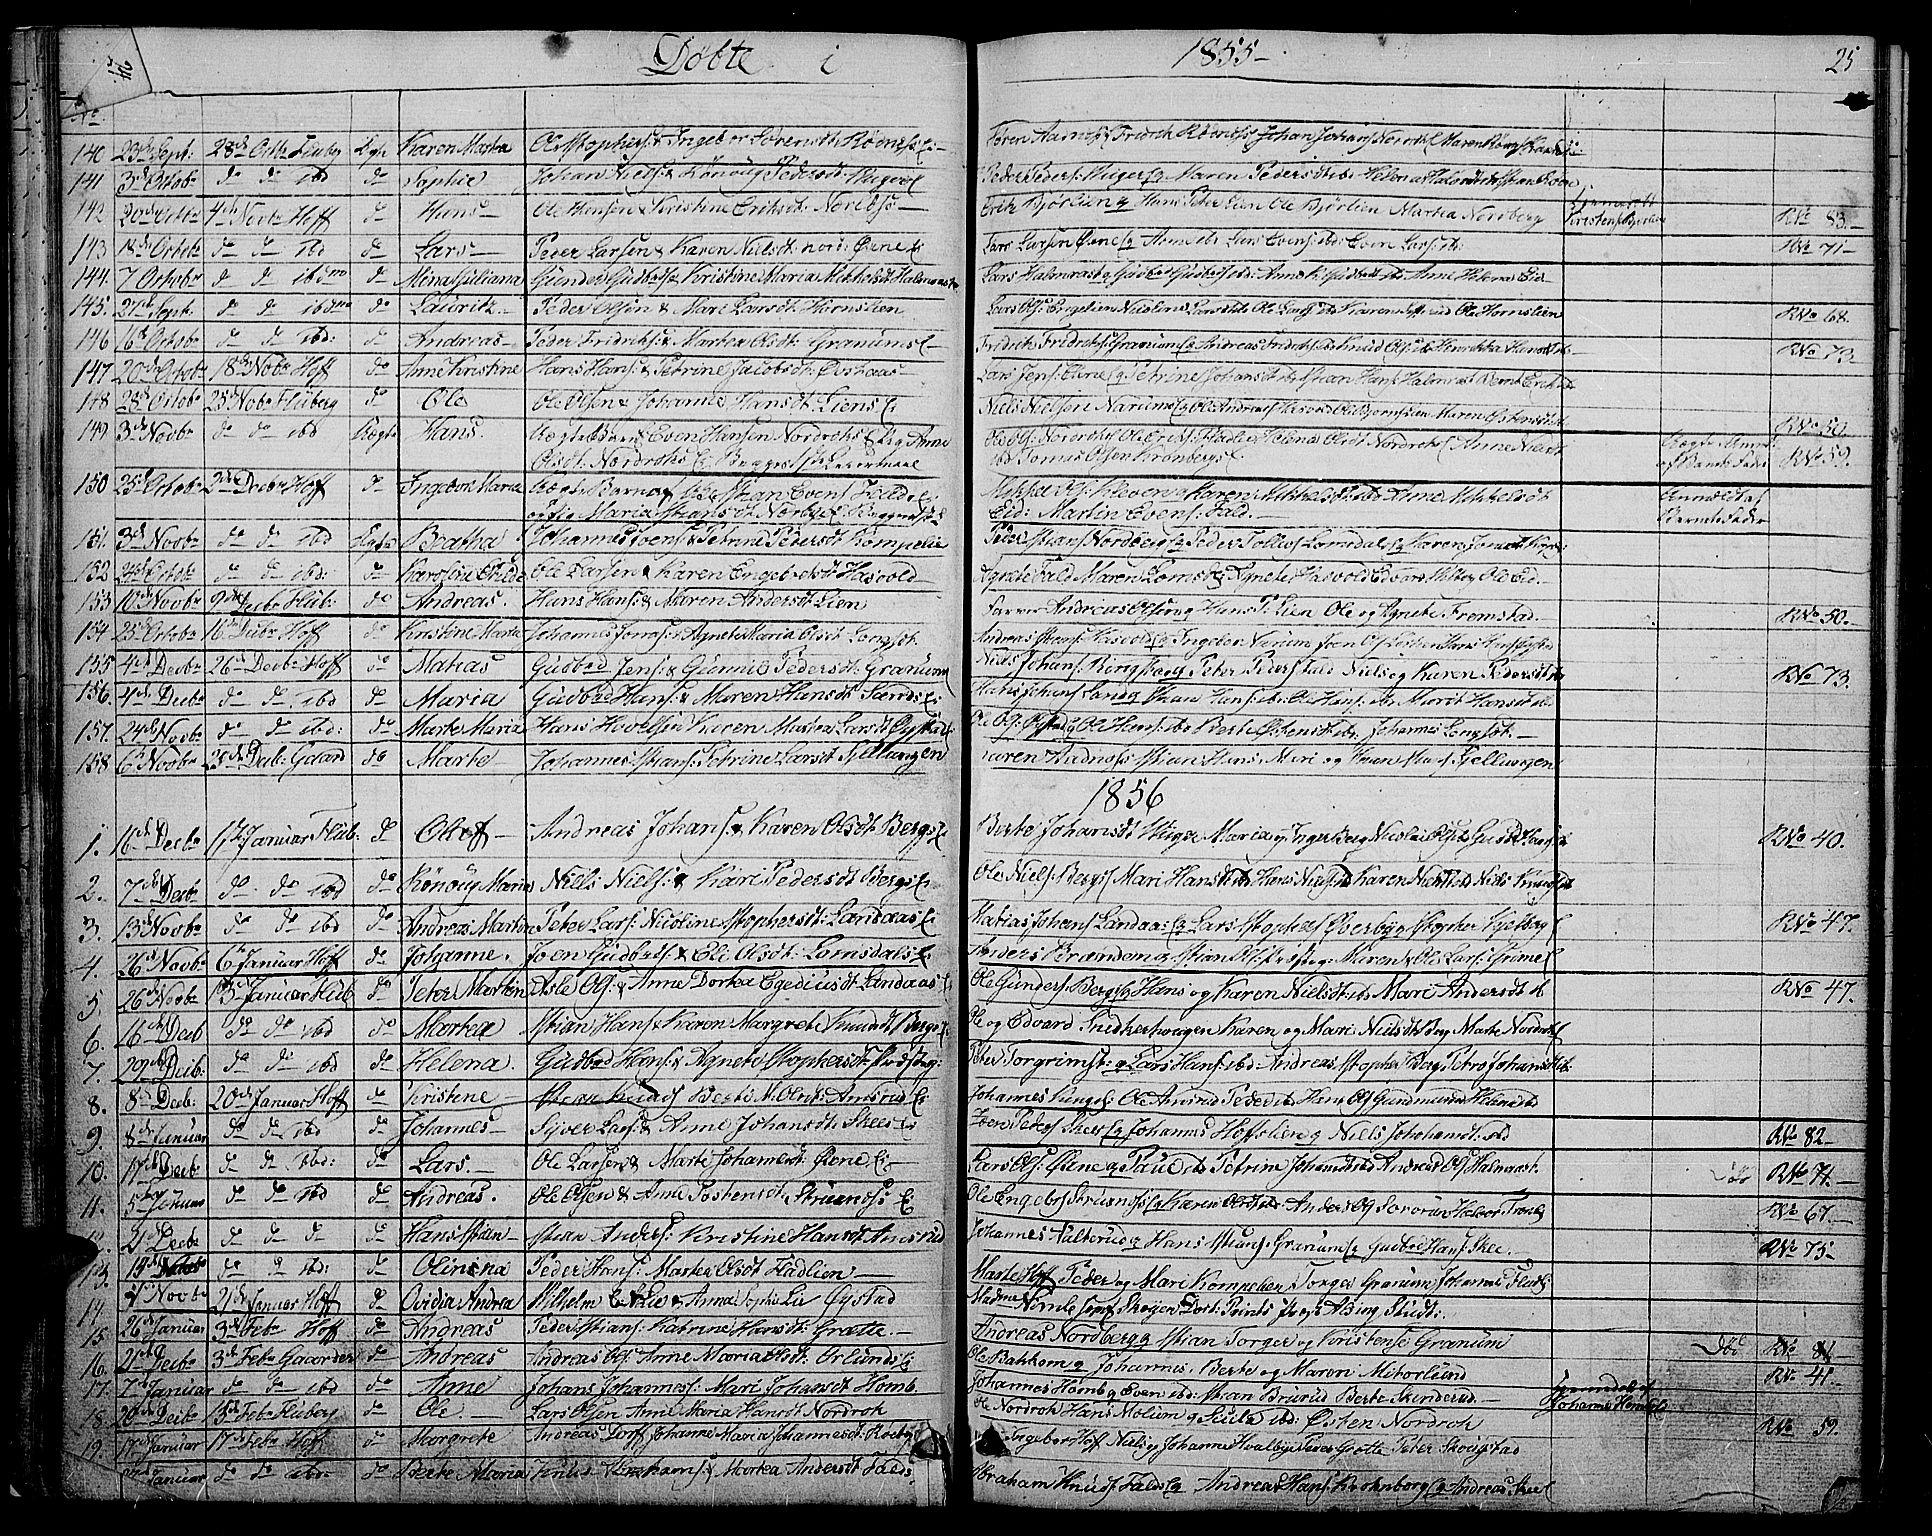 SAH, Søndre Land prestekontor, L/L0001: Klokkerbok nr. 1, 1849-1883, s. 25